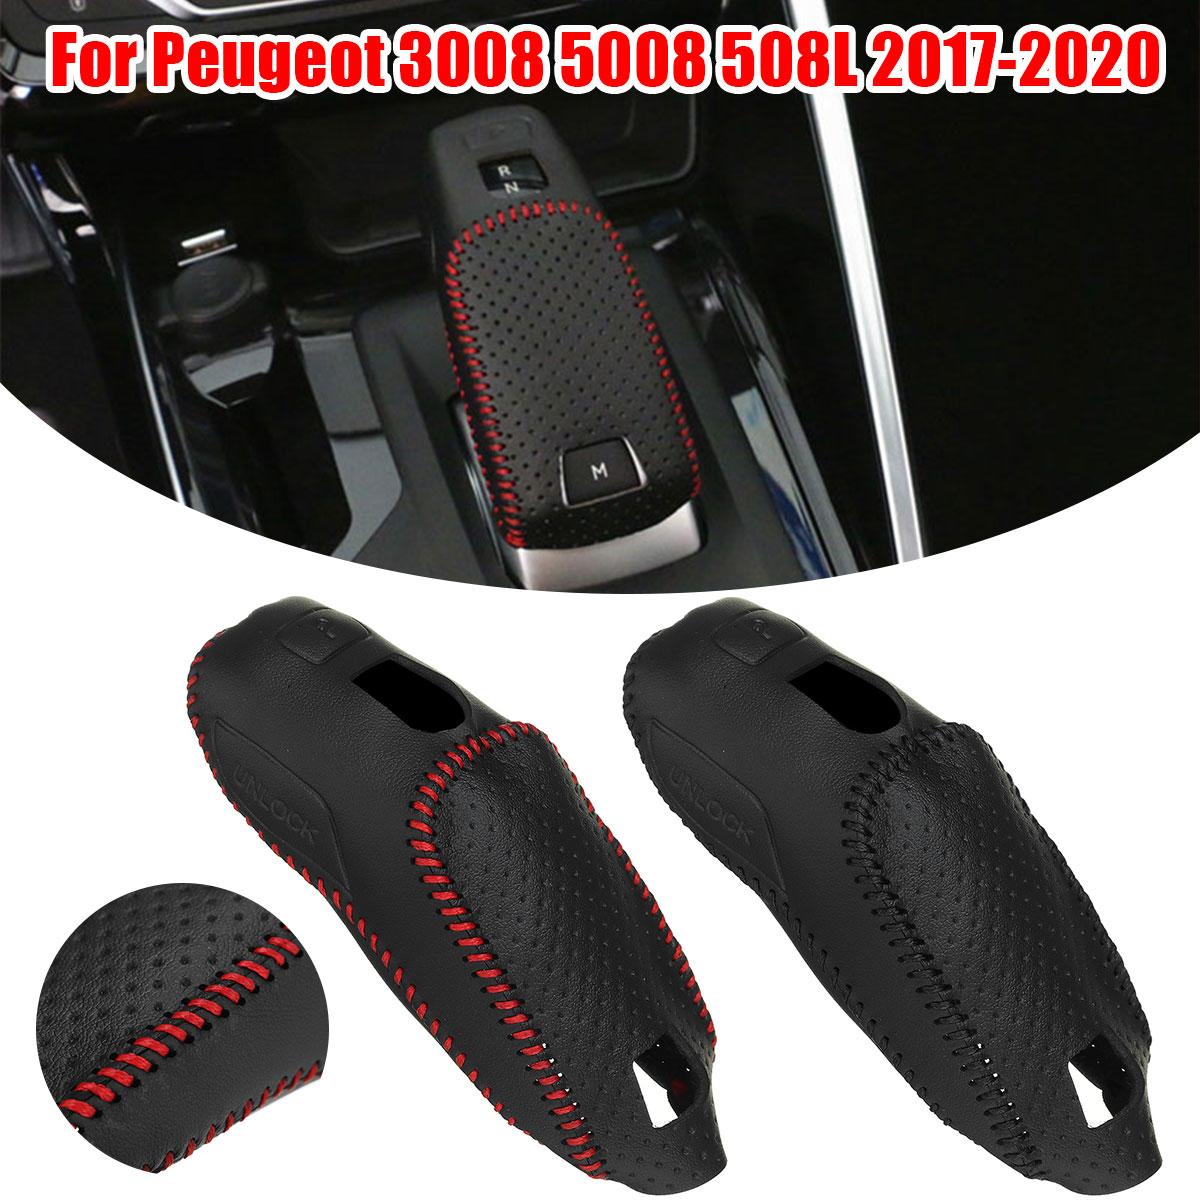 Car Gear Shift Knob Cover Trim Auto Shifter Lever Stick Cover Protector For Peugeot 3008 5008 508L 2017 2018 2019 2020